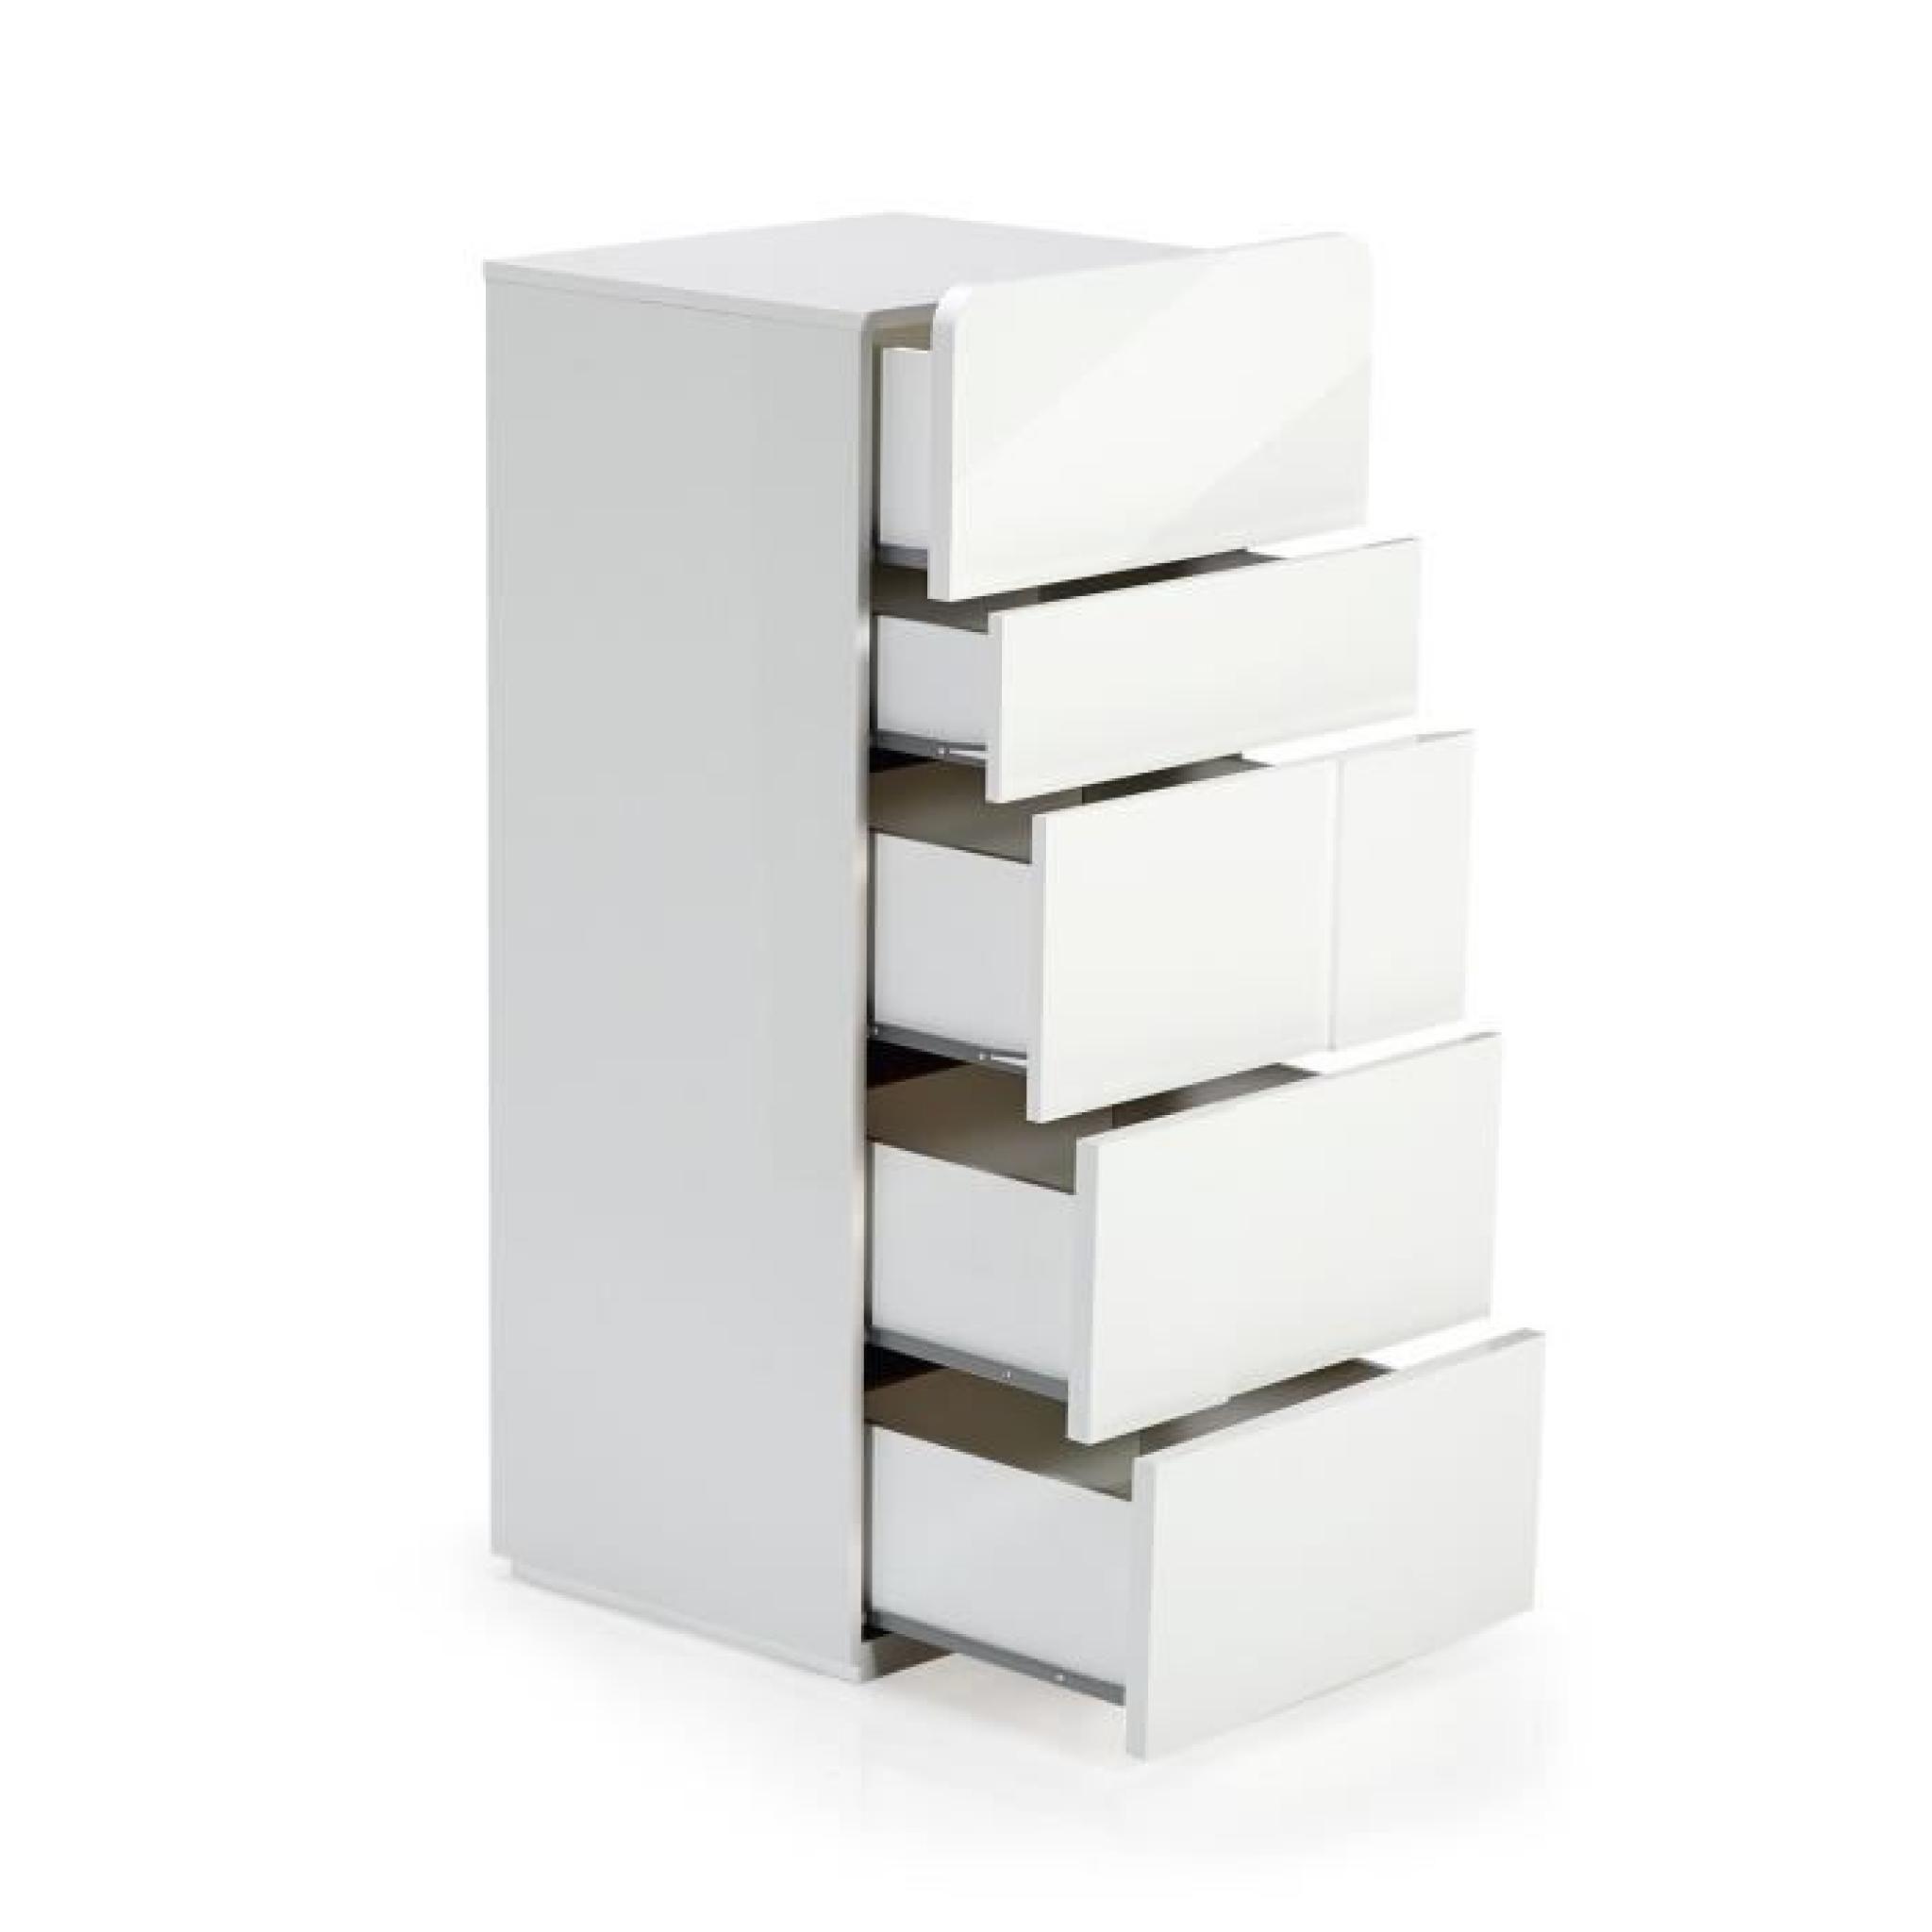 Magnifique Chiffonnier 5 Tiroirs Blanc D Coration Fran Aise  # Commode Laquee Blanche Avec Tiroirs Rabattables